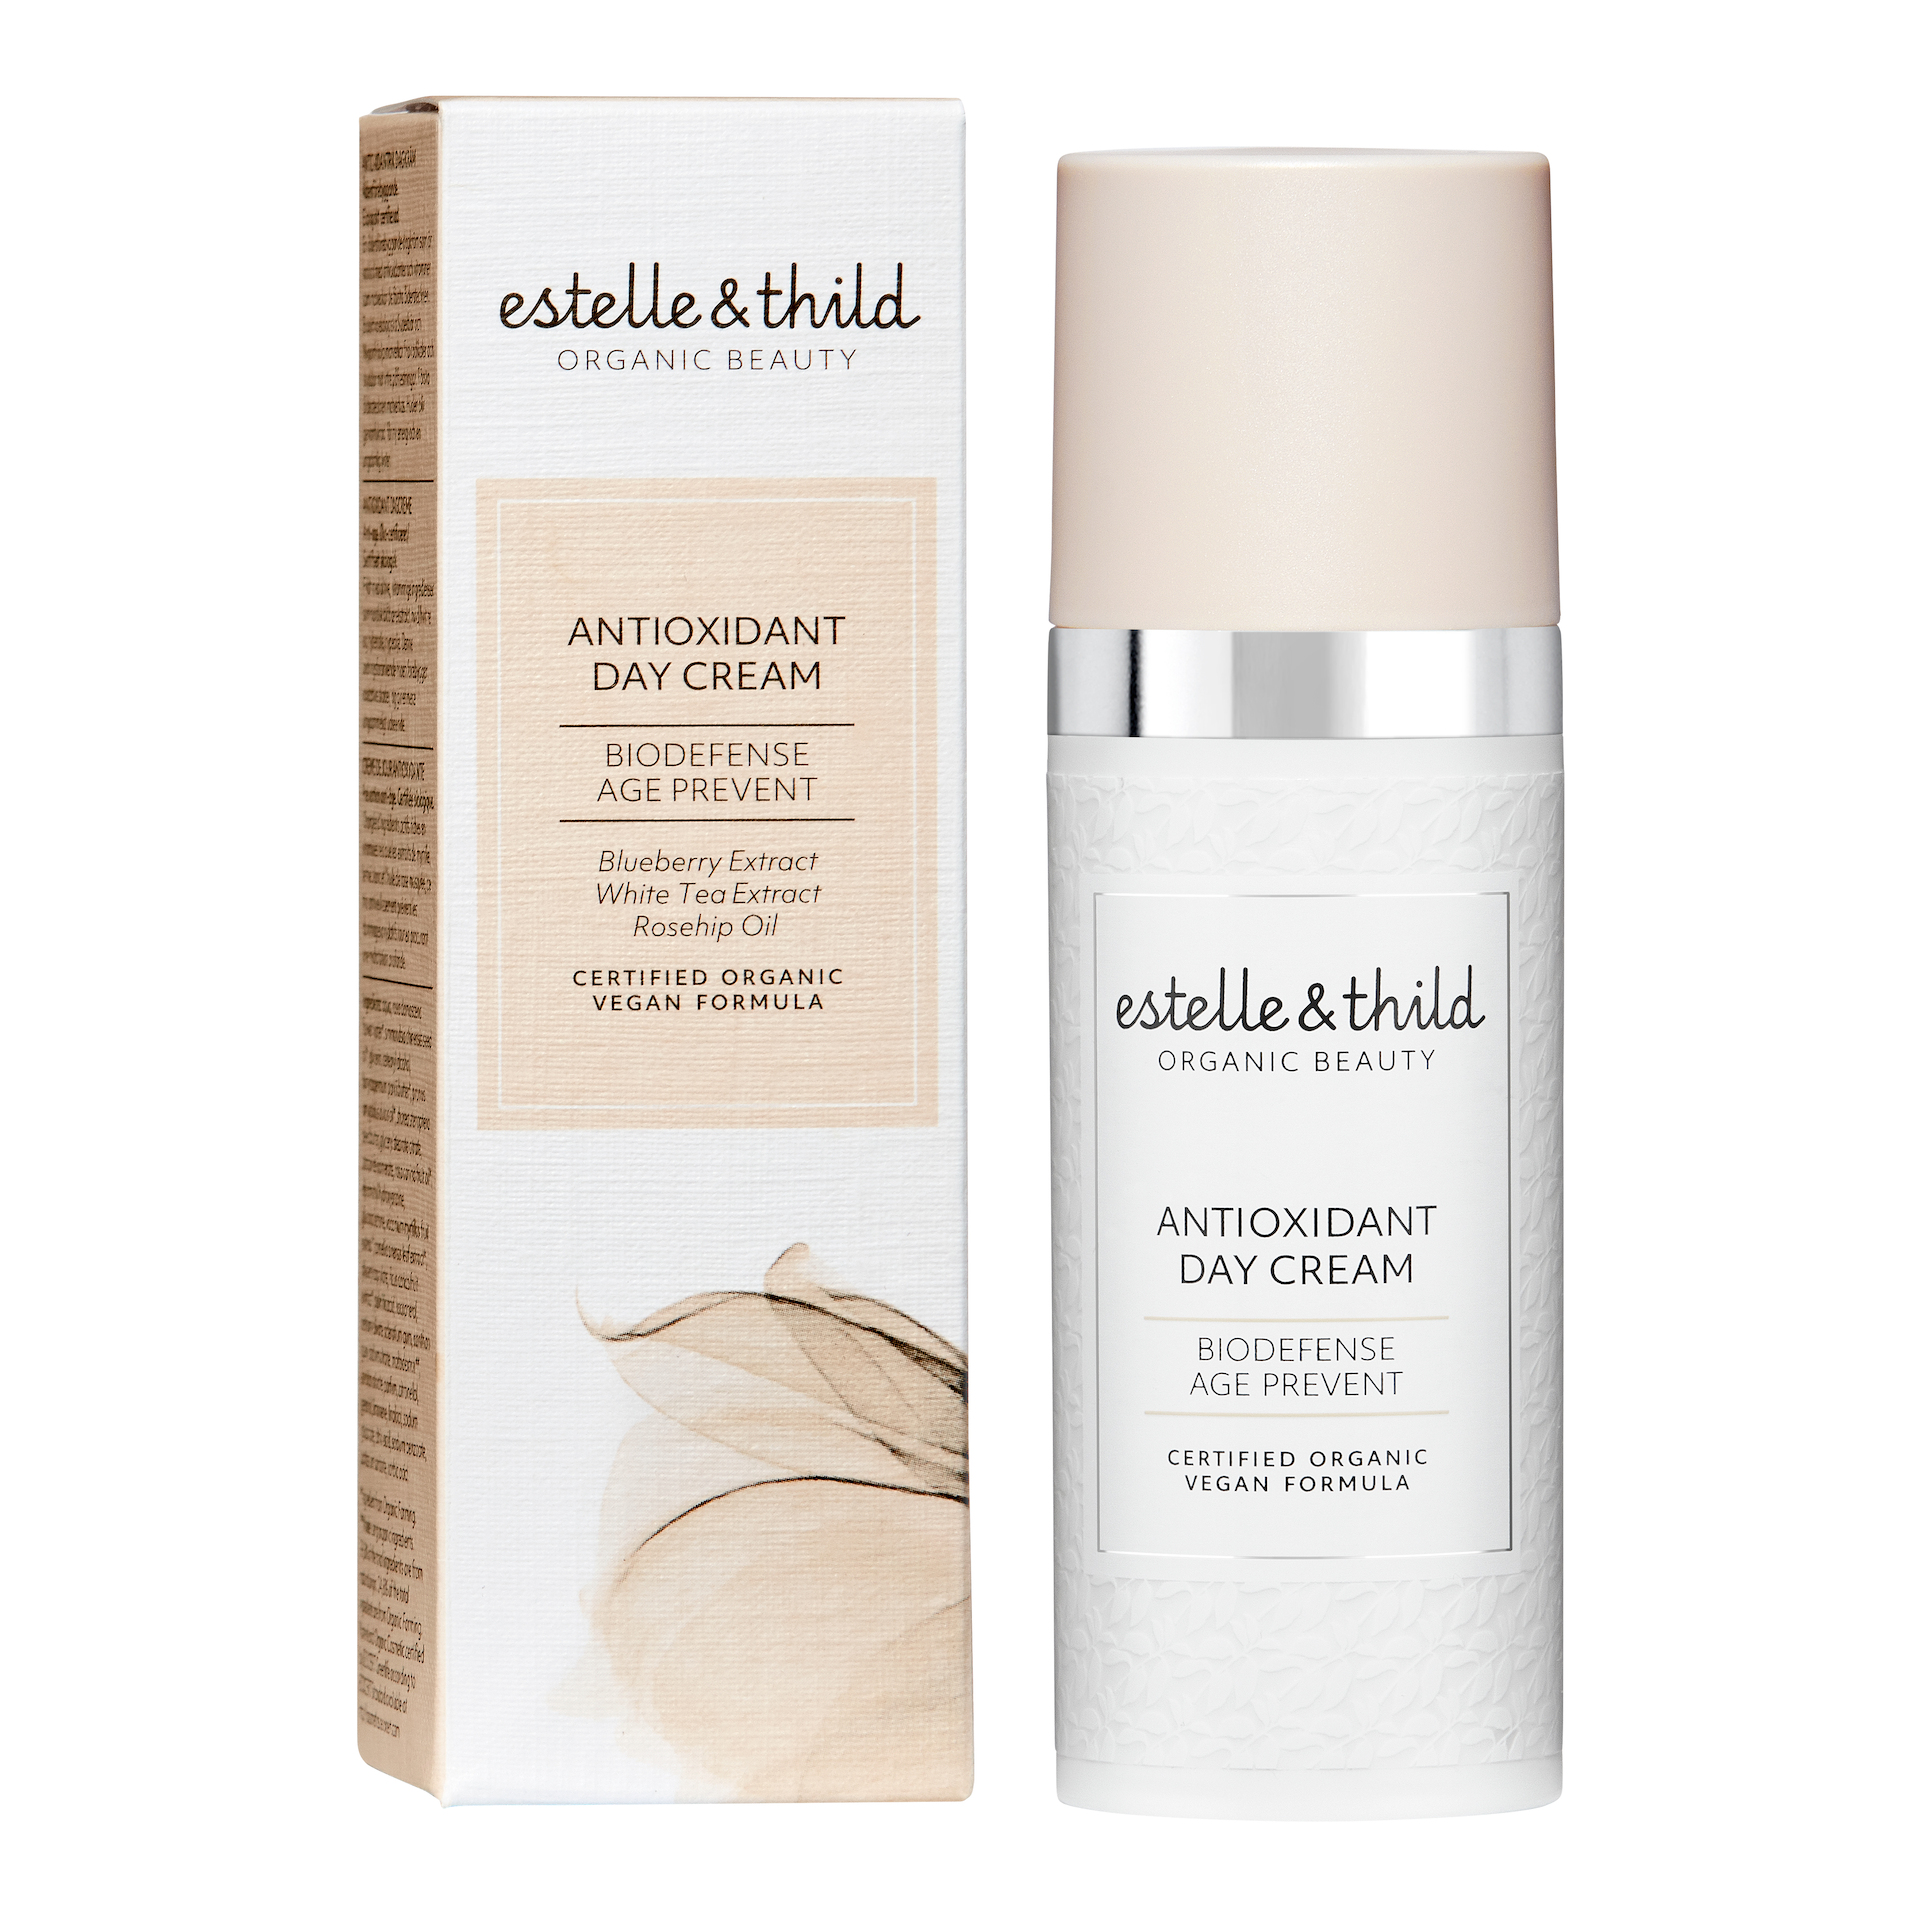 BioDefense Antioxidant Day Cream 50ml